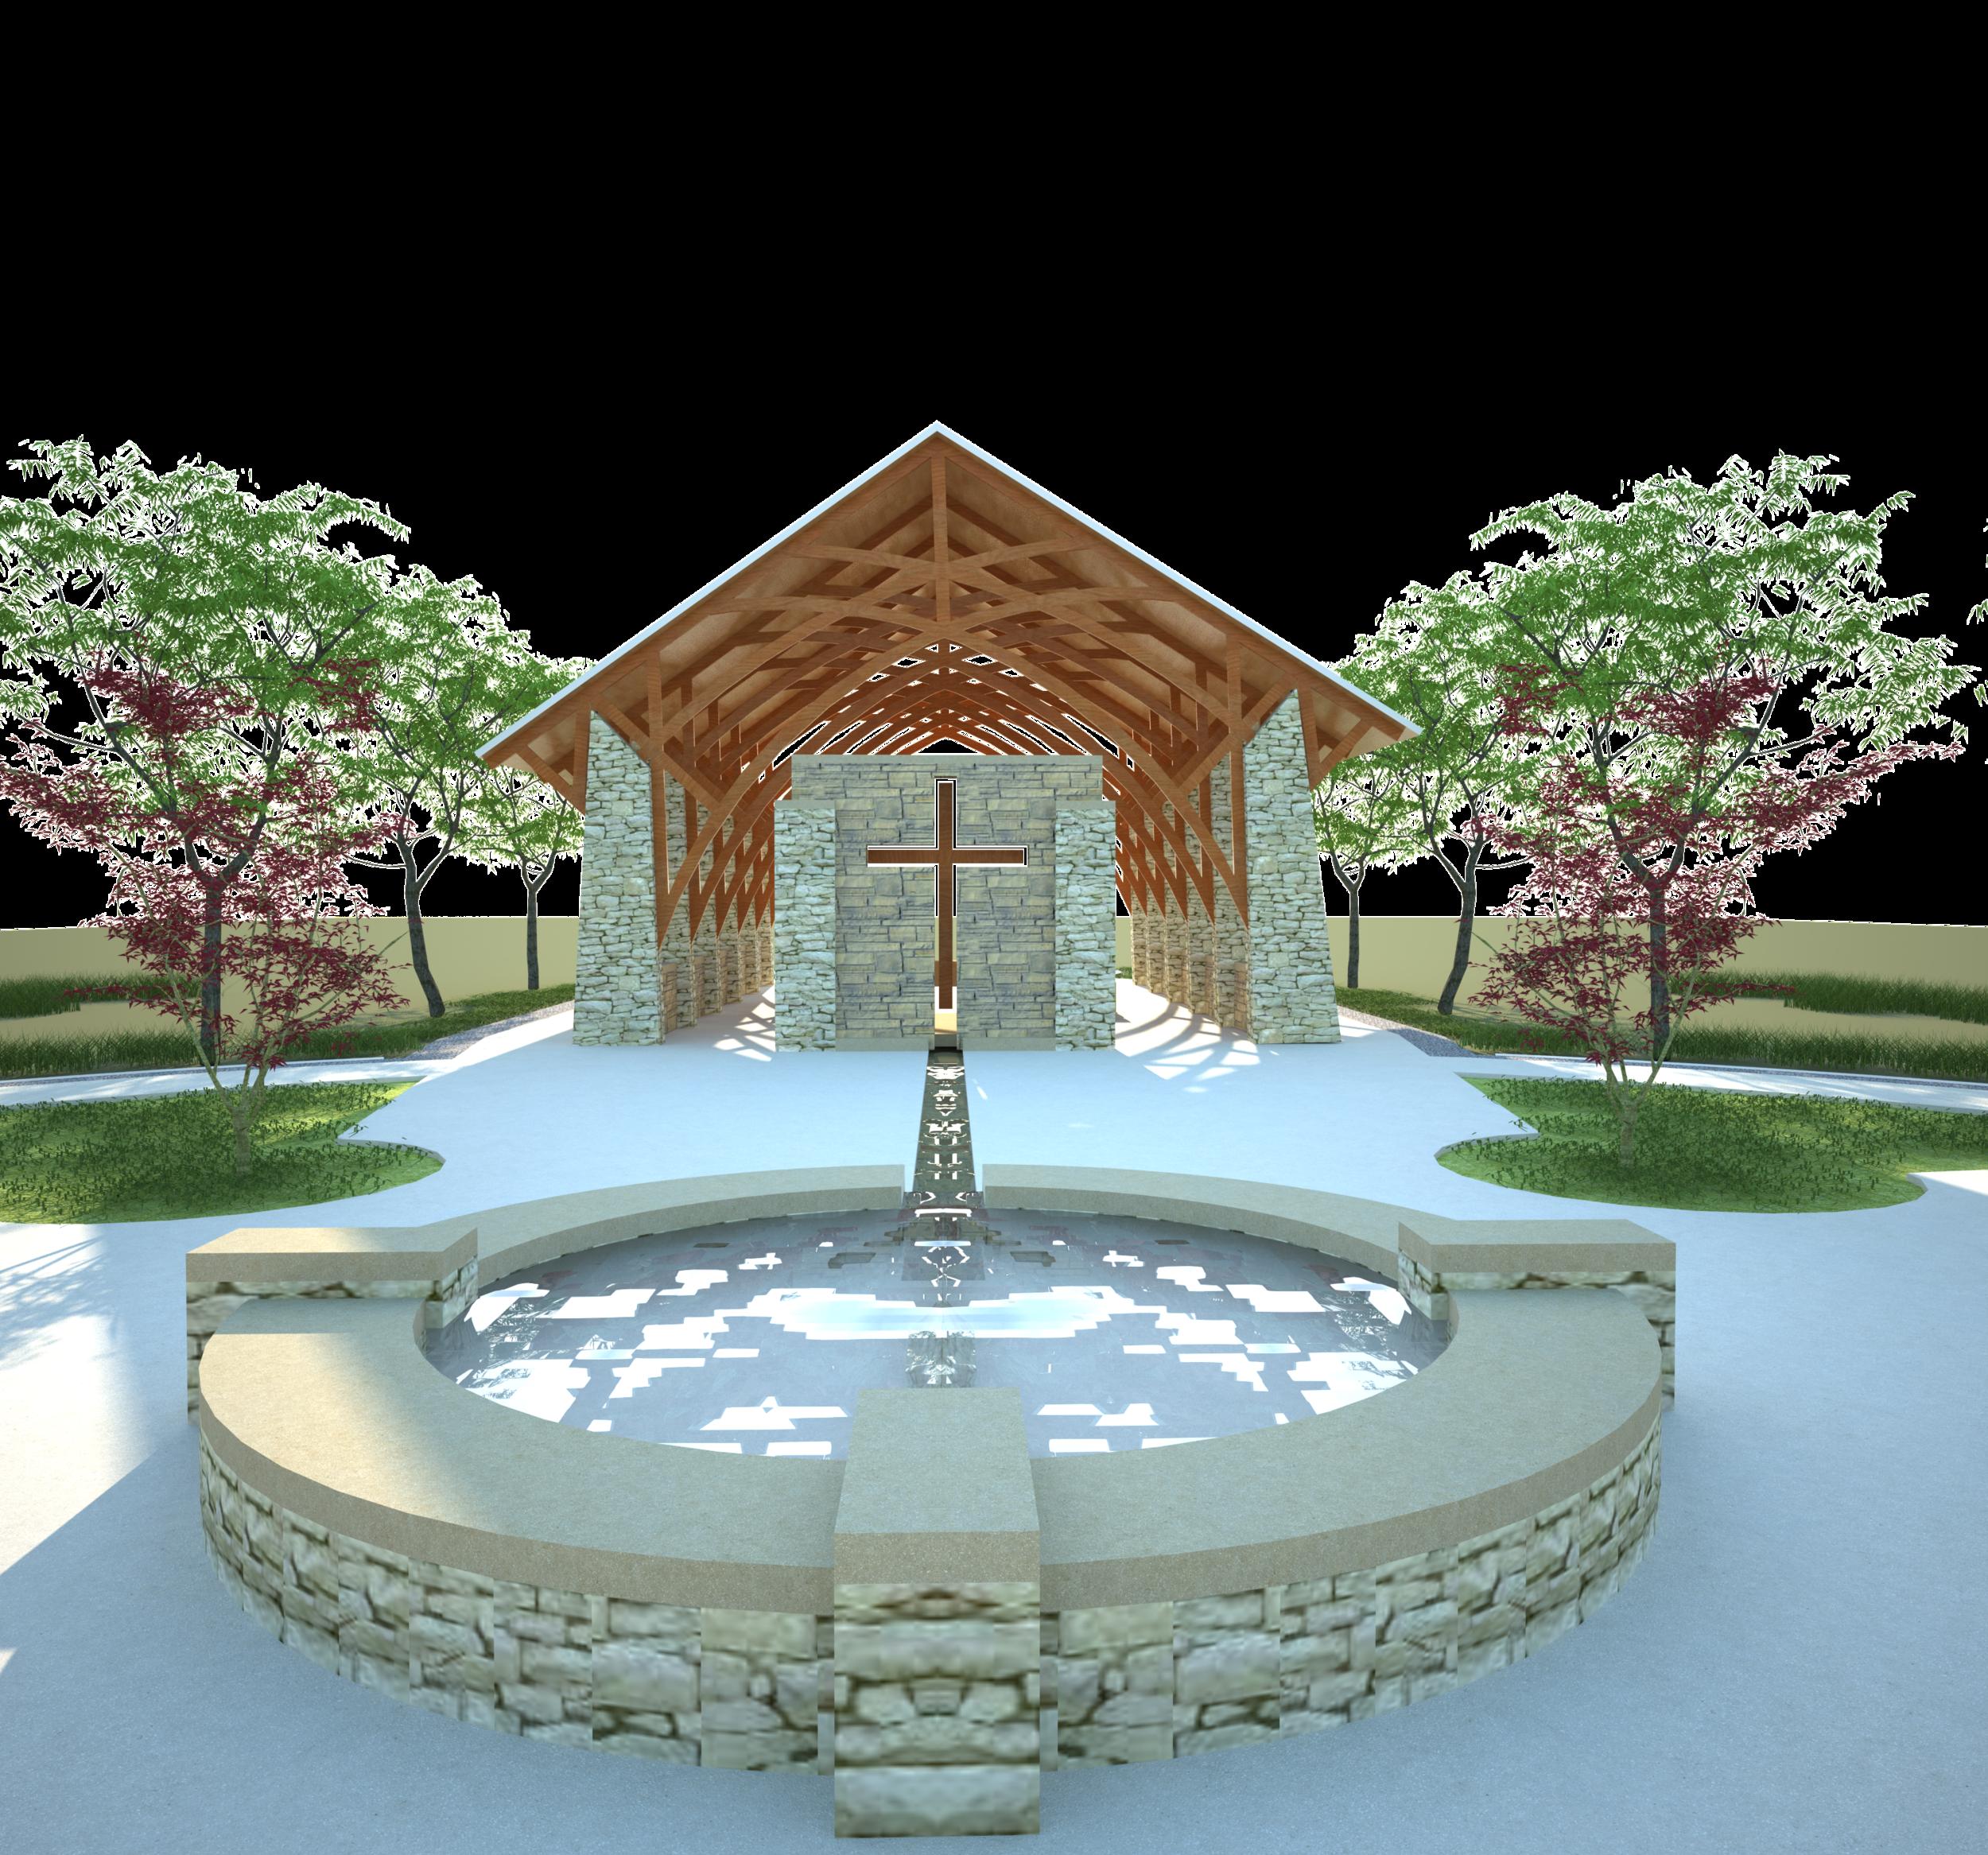 ADW-Faith-Based-St-Anne-Catholic-Church-Rock-Hill-SC-Exterior-2.png